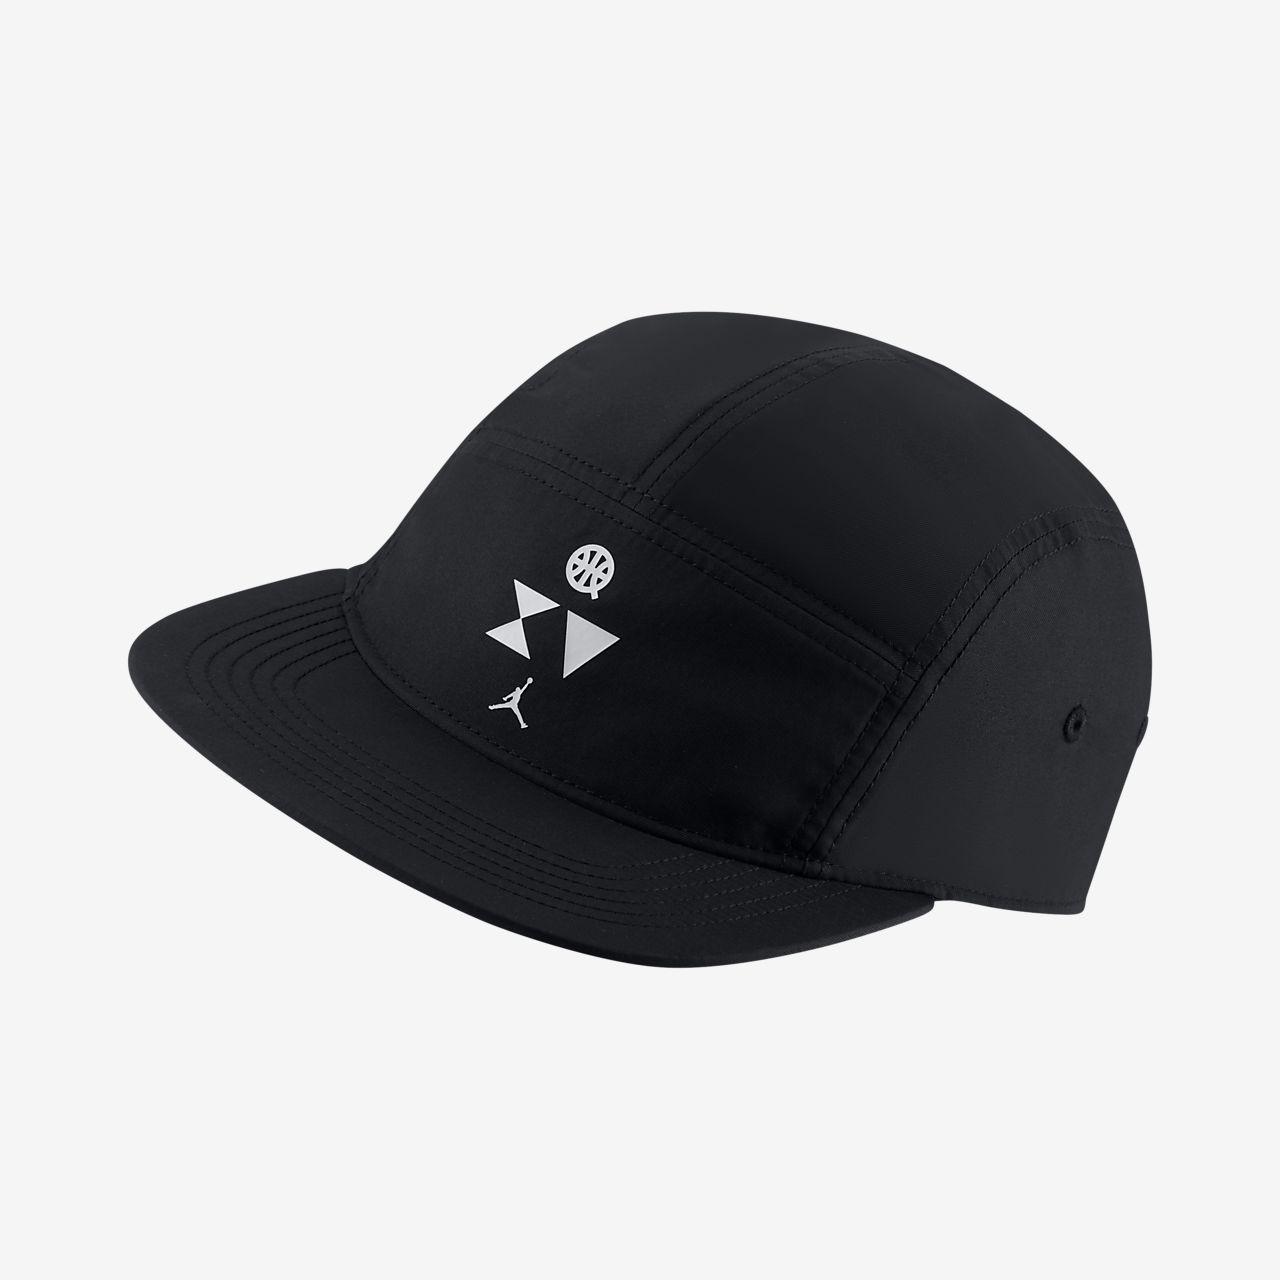 Jordan AW84 Quai54 Şapka